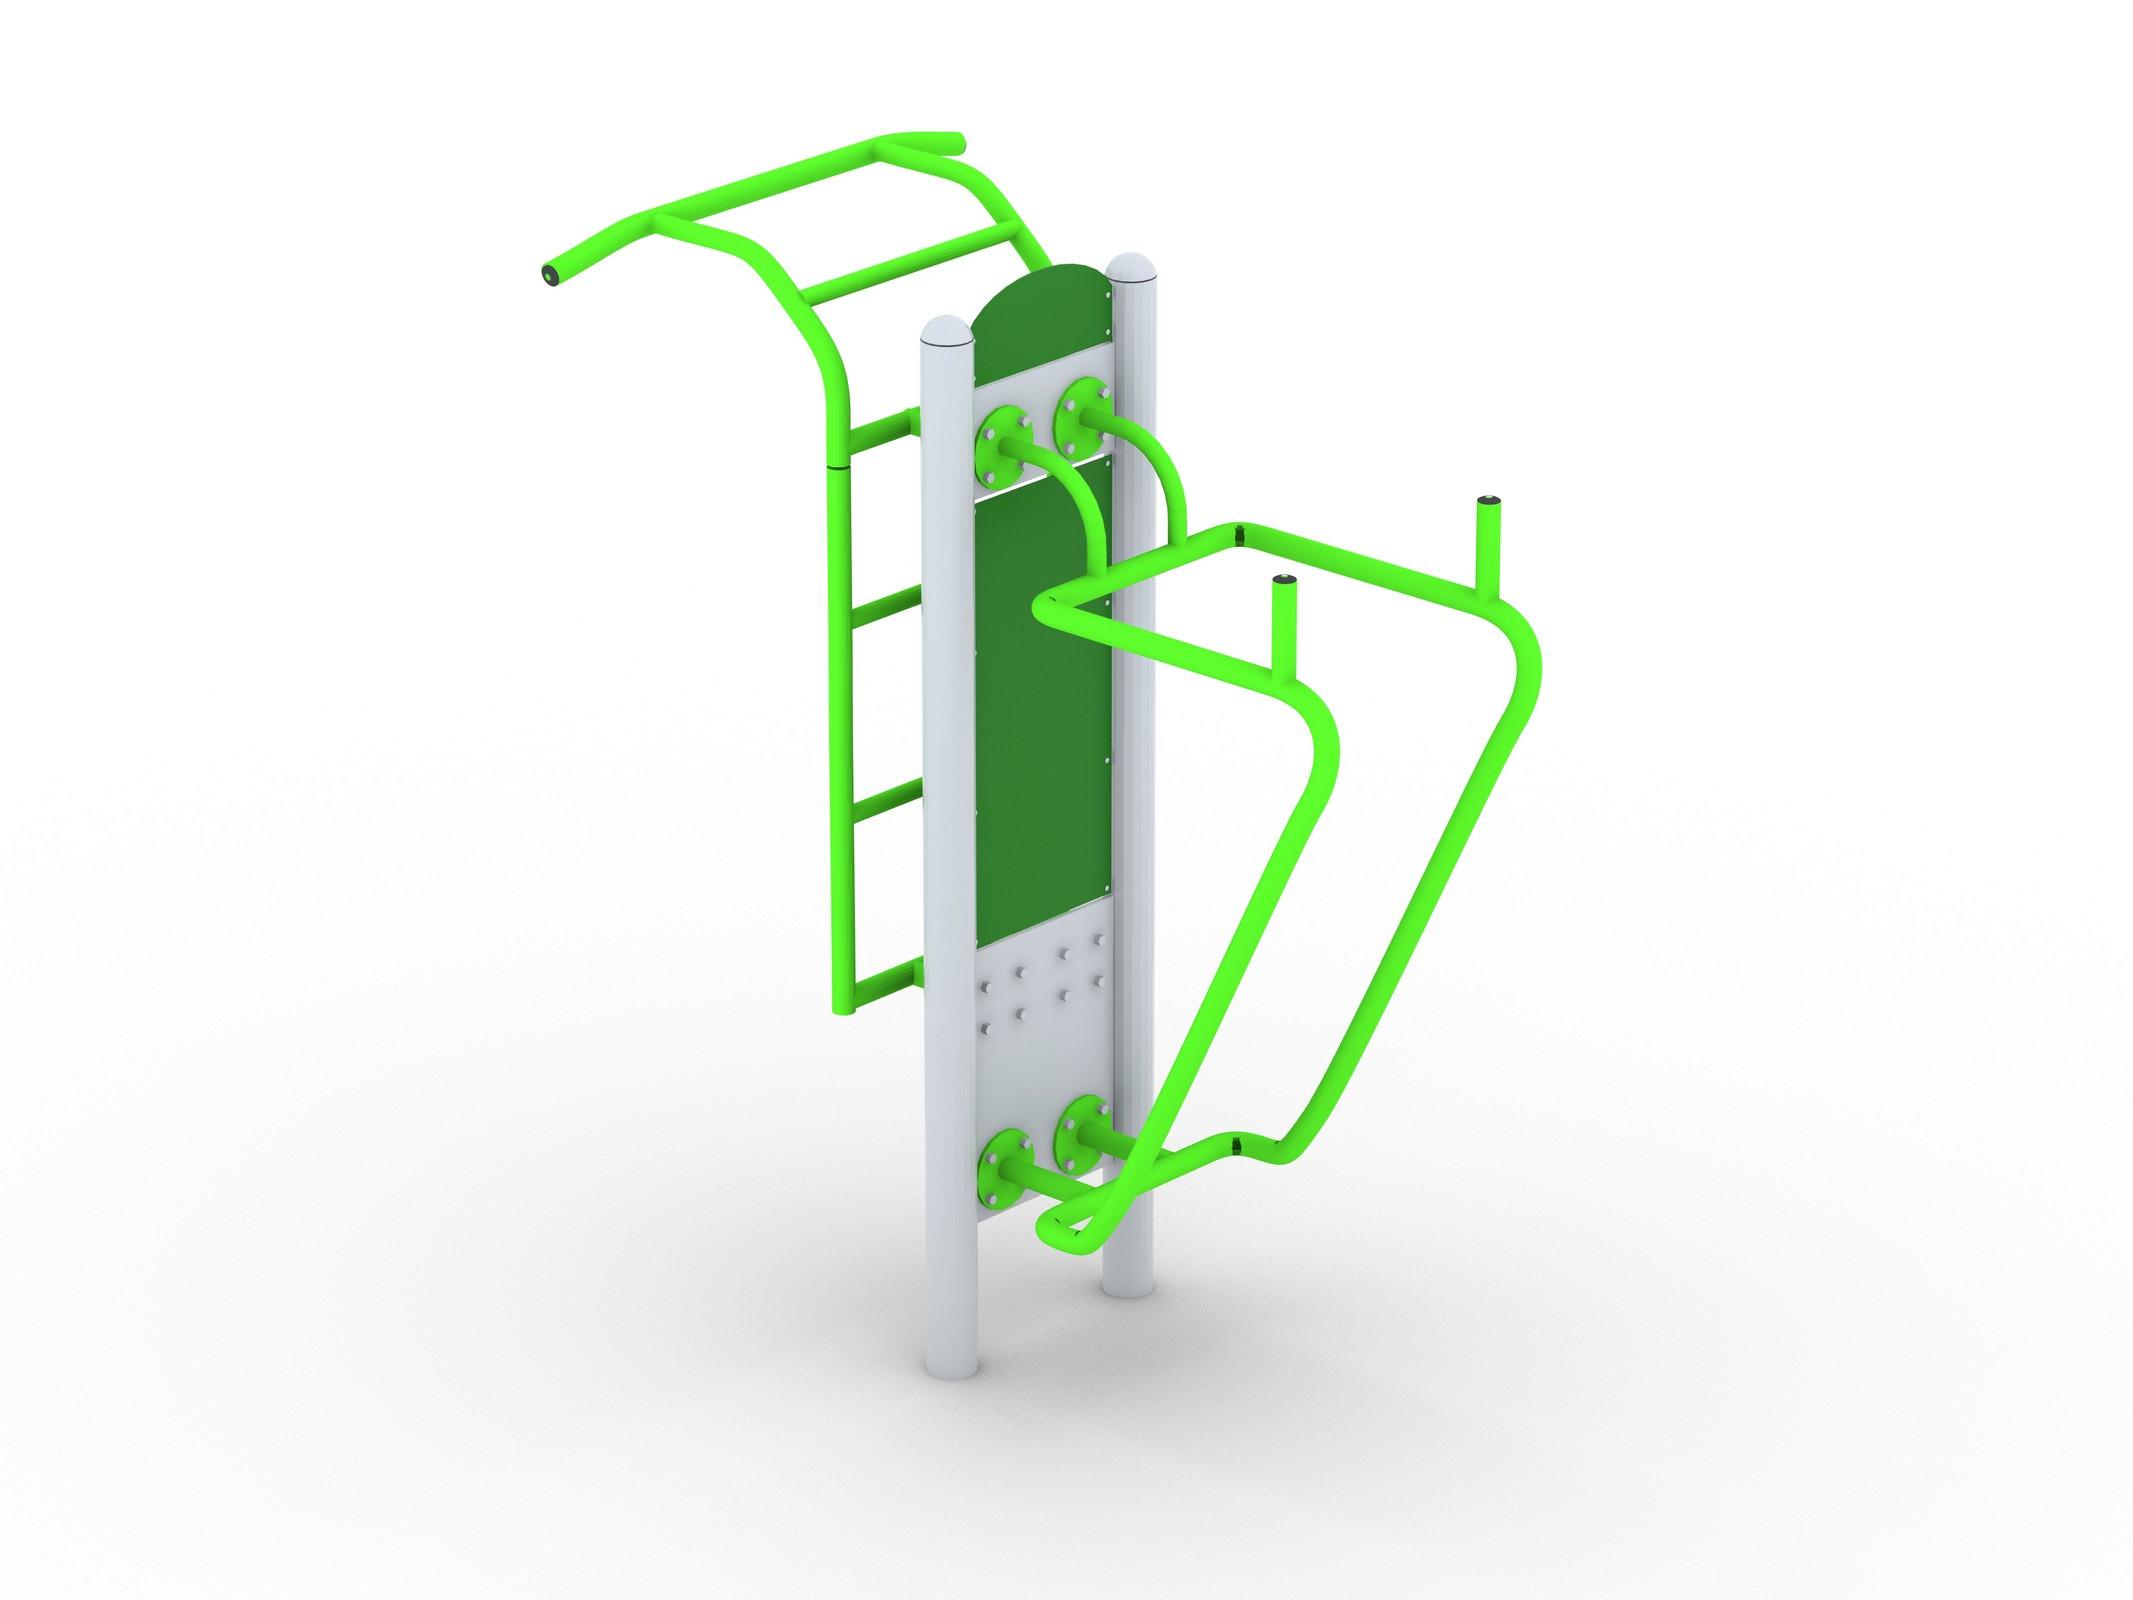 Ladder And Leg Raise